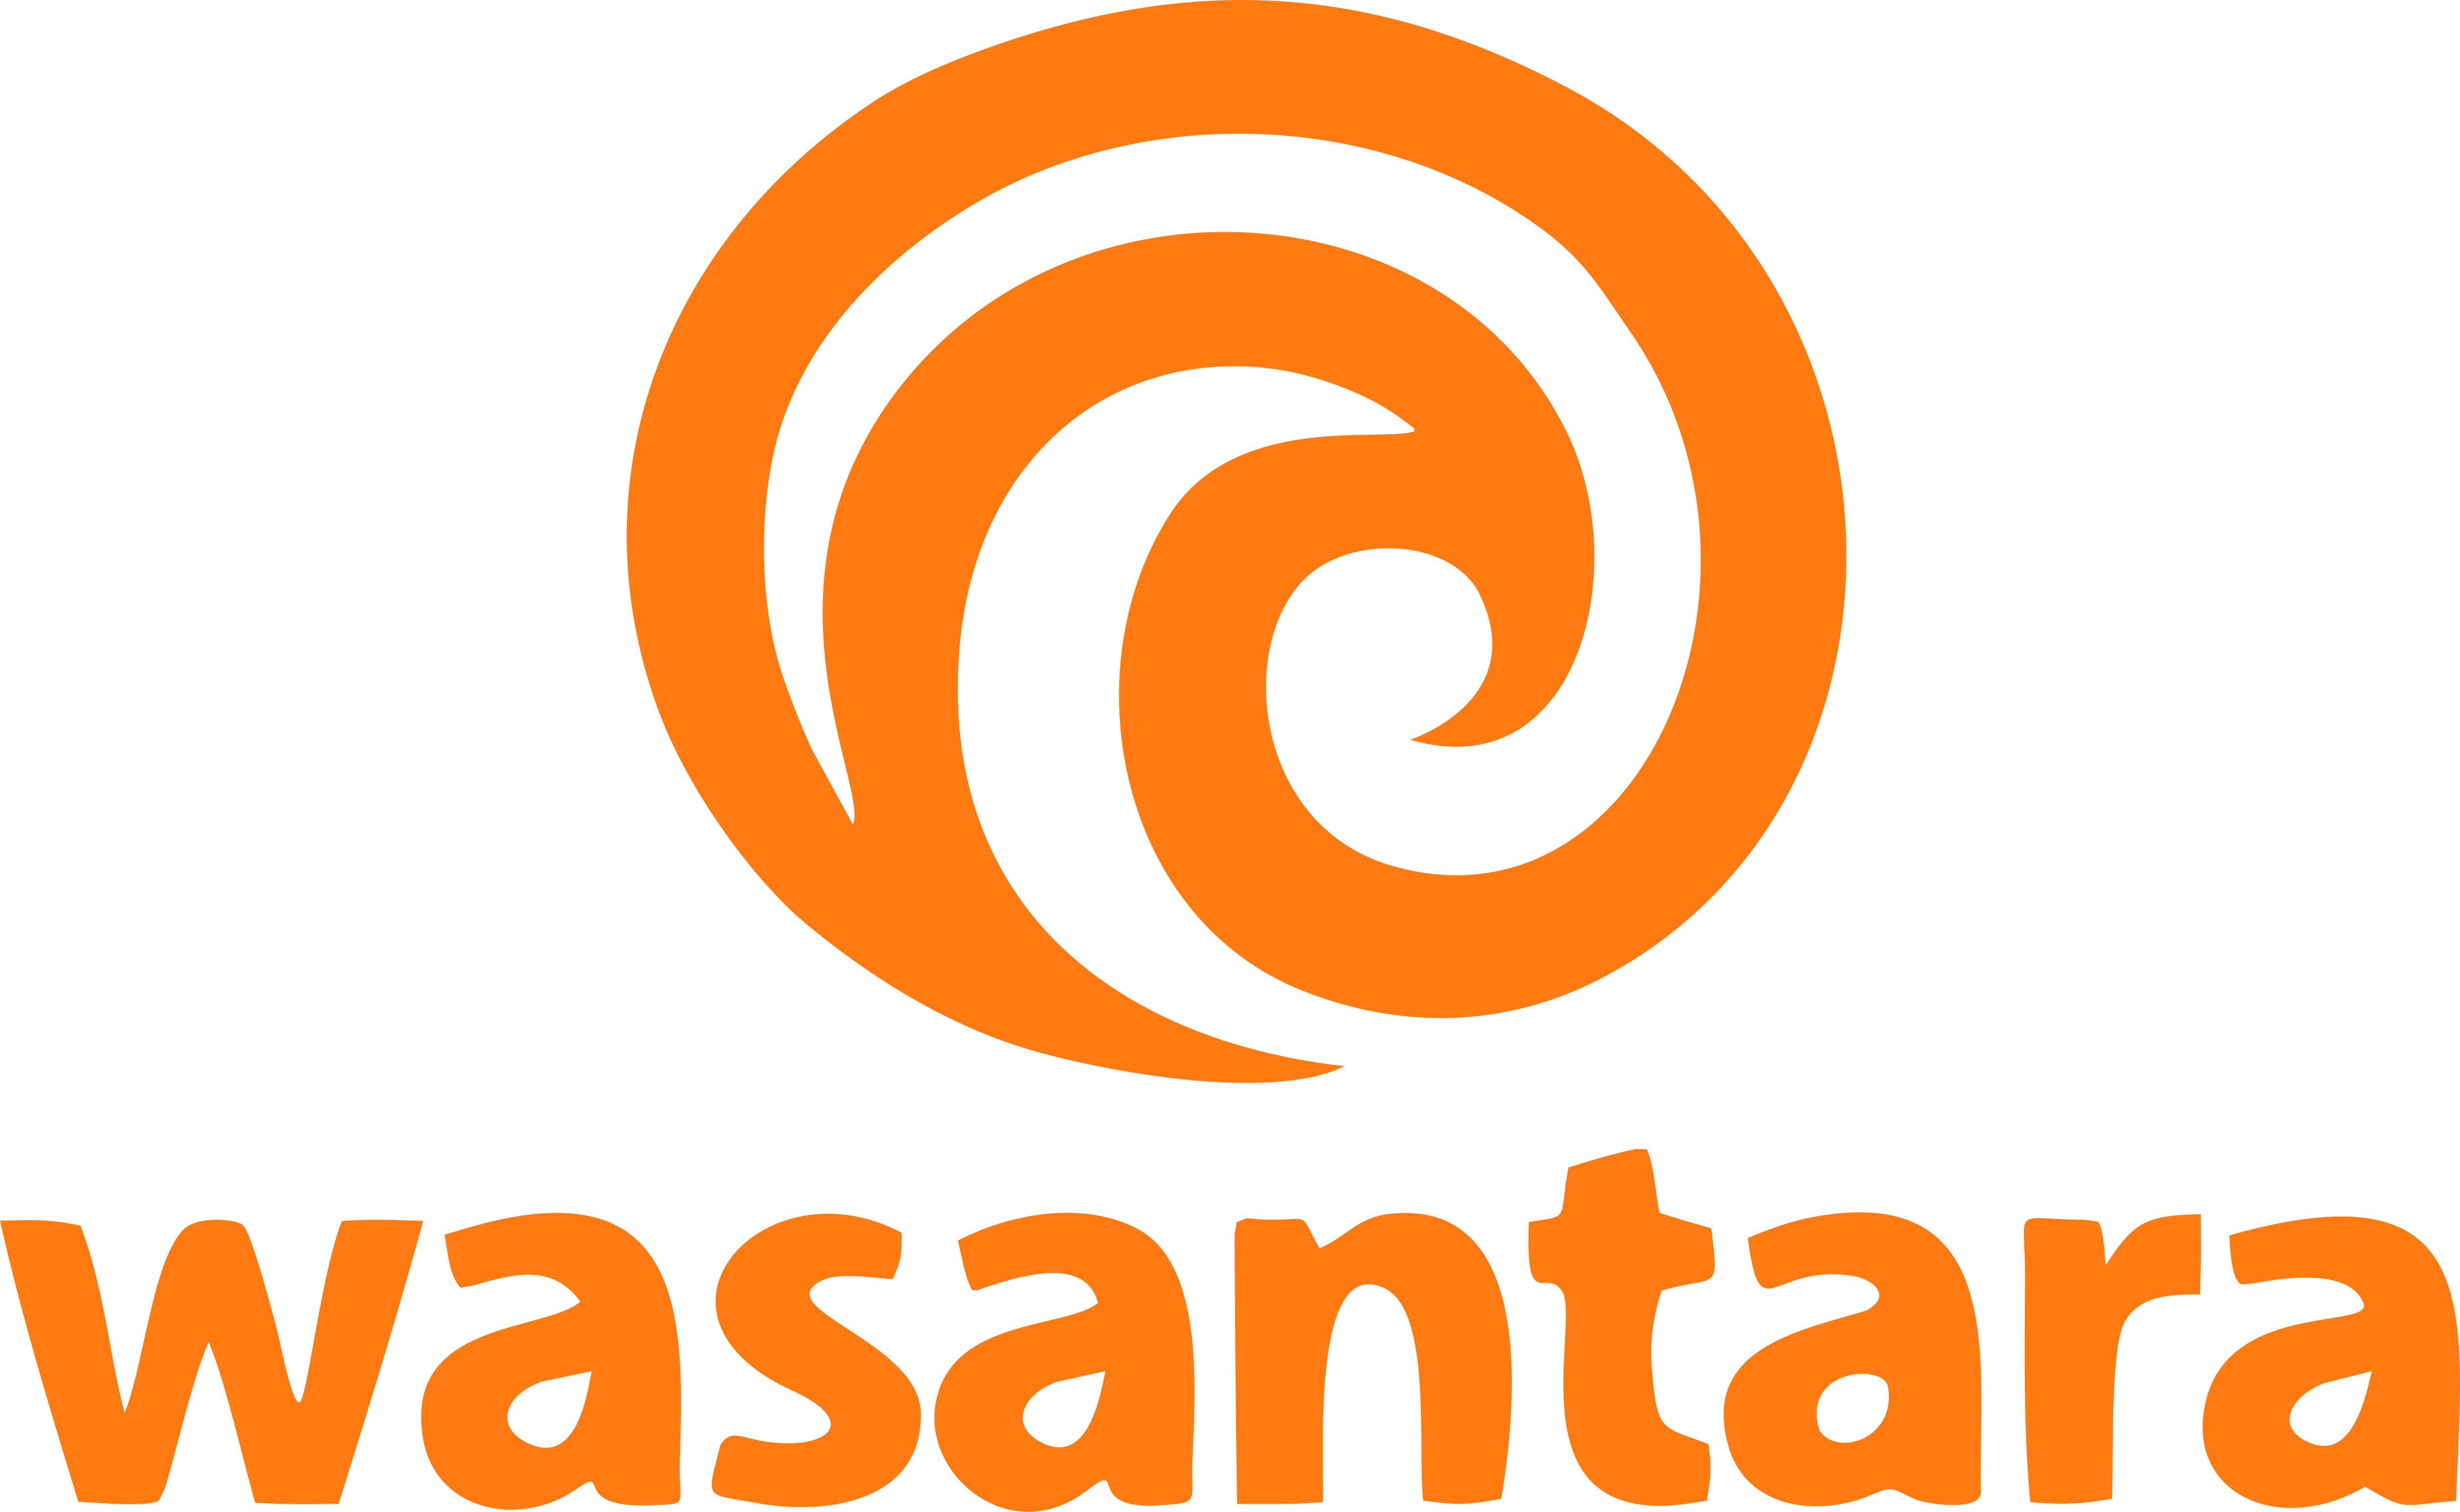 Bhakti Wasantara Net